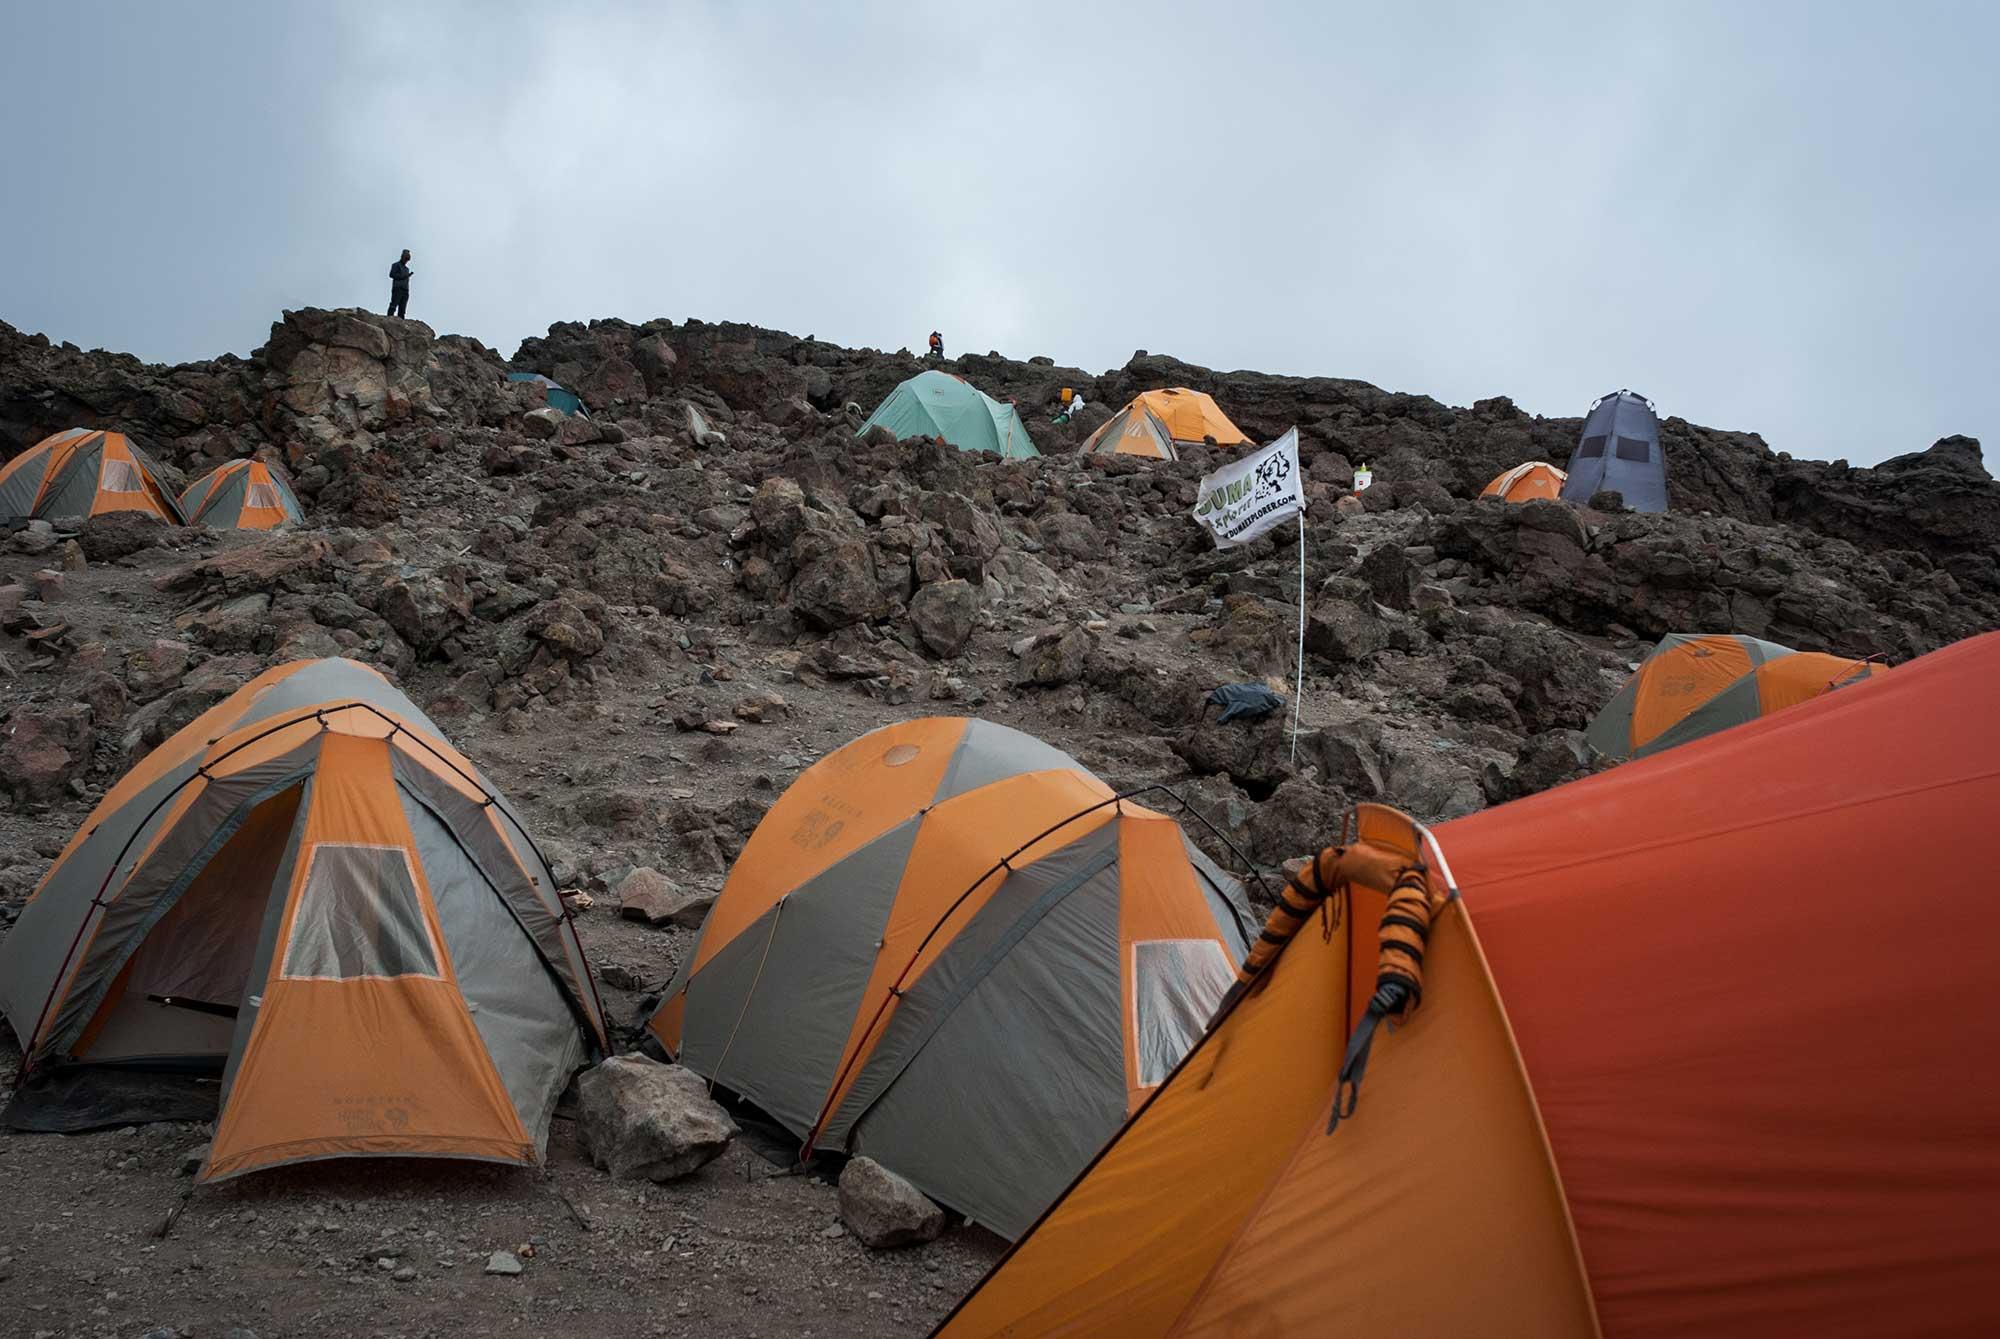 D6-45-tight-quarters-barufu-camp-kilimanjaro.jpg